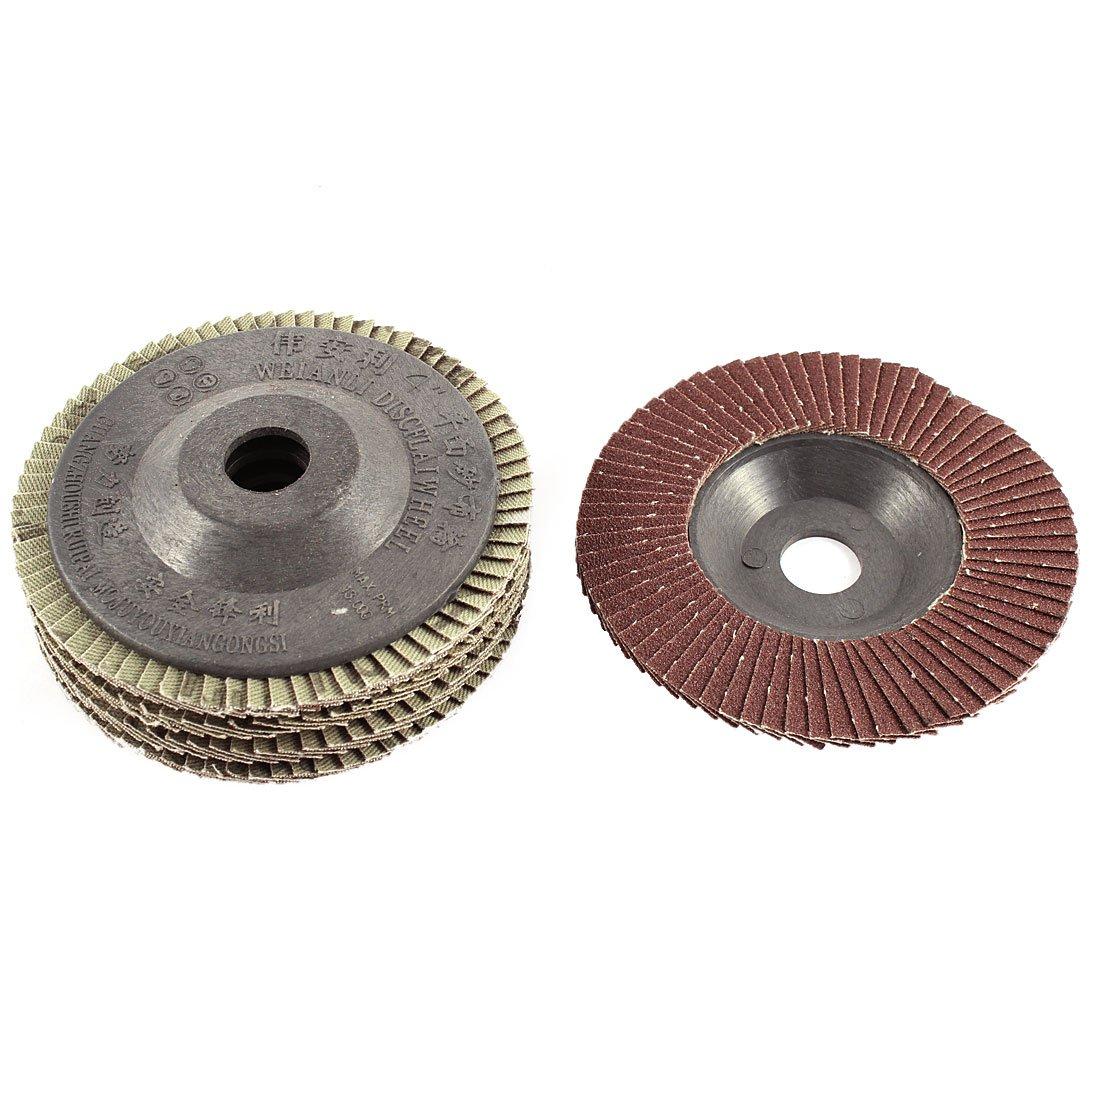 uxcell Metal 4'' x 5/8'' 60 Grit Flap Sanding Discs Grinding Wheel 5pcs